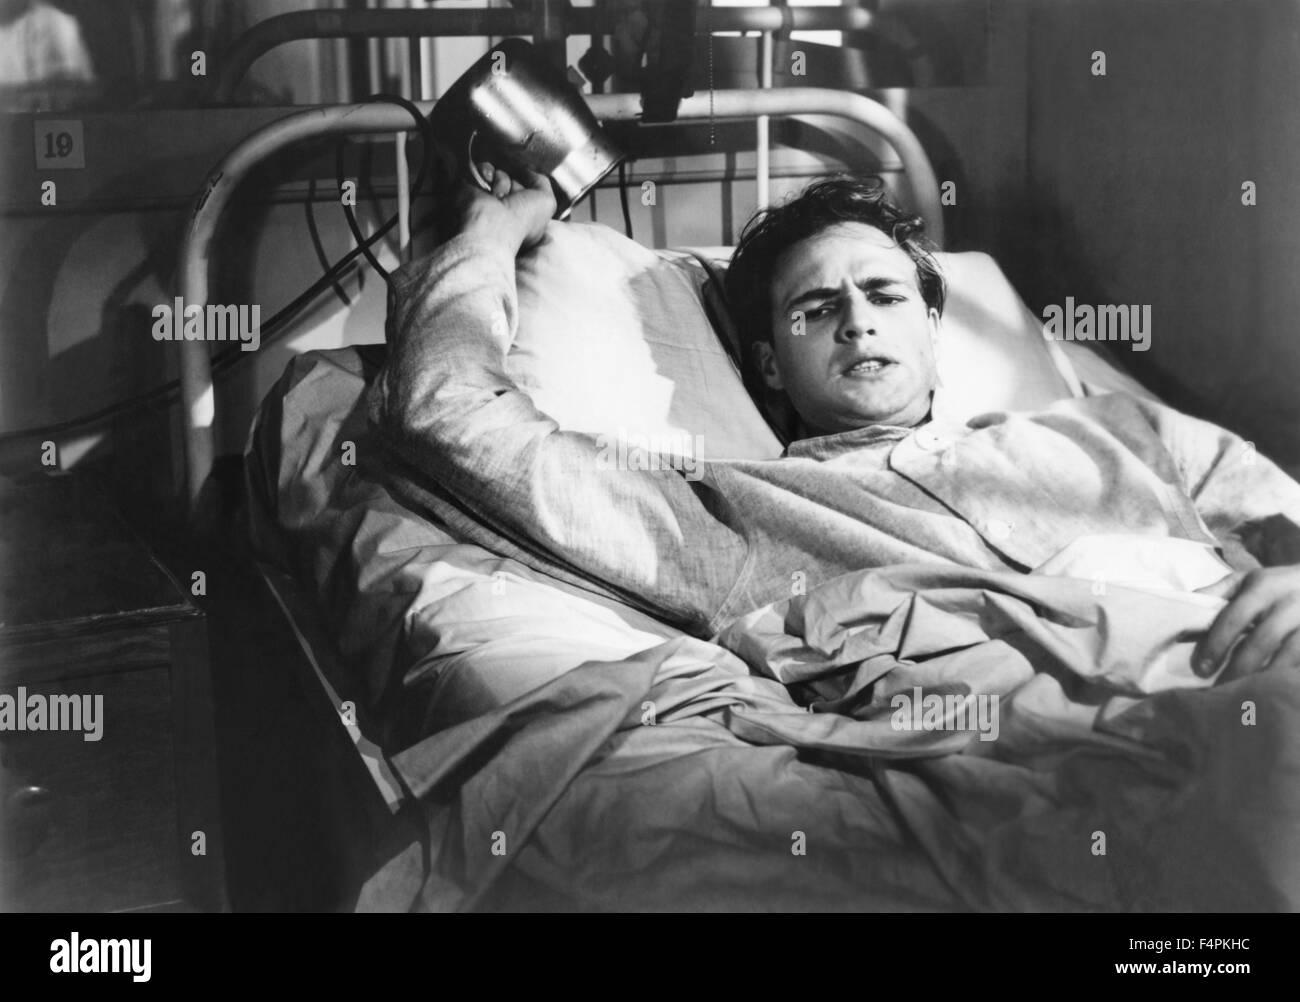 Marlon Brando / The Men / 1950 directed by Fred Zinnemann [United Artists] - Stock Image